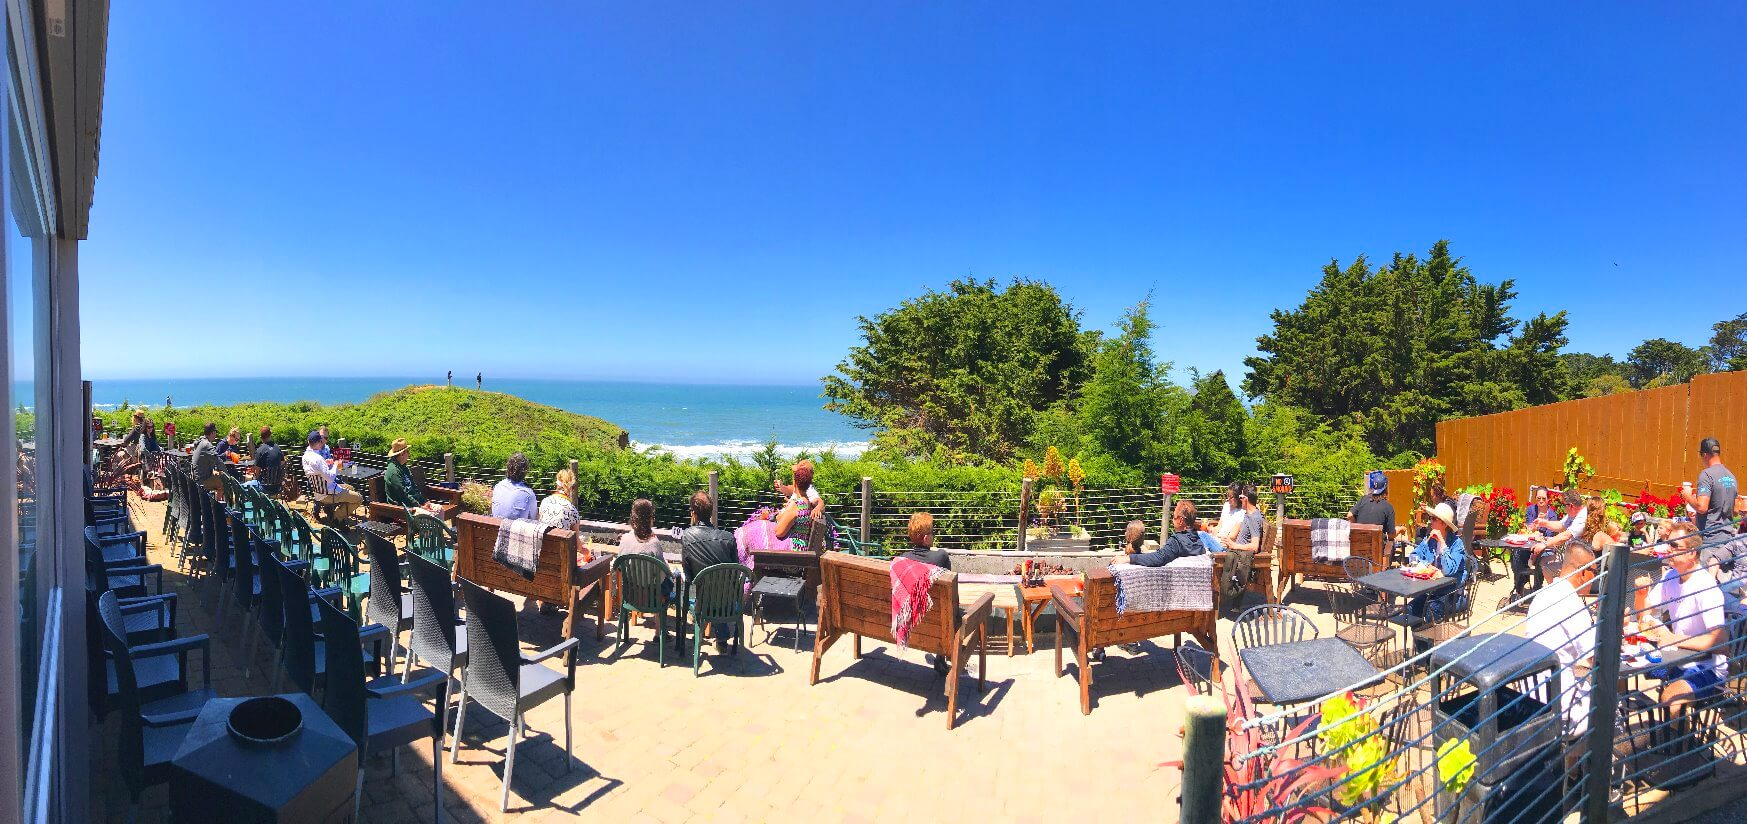 oceanside_restaurants_along_california_pacific_coast_highway_1